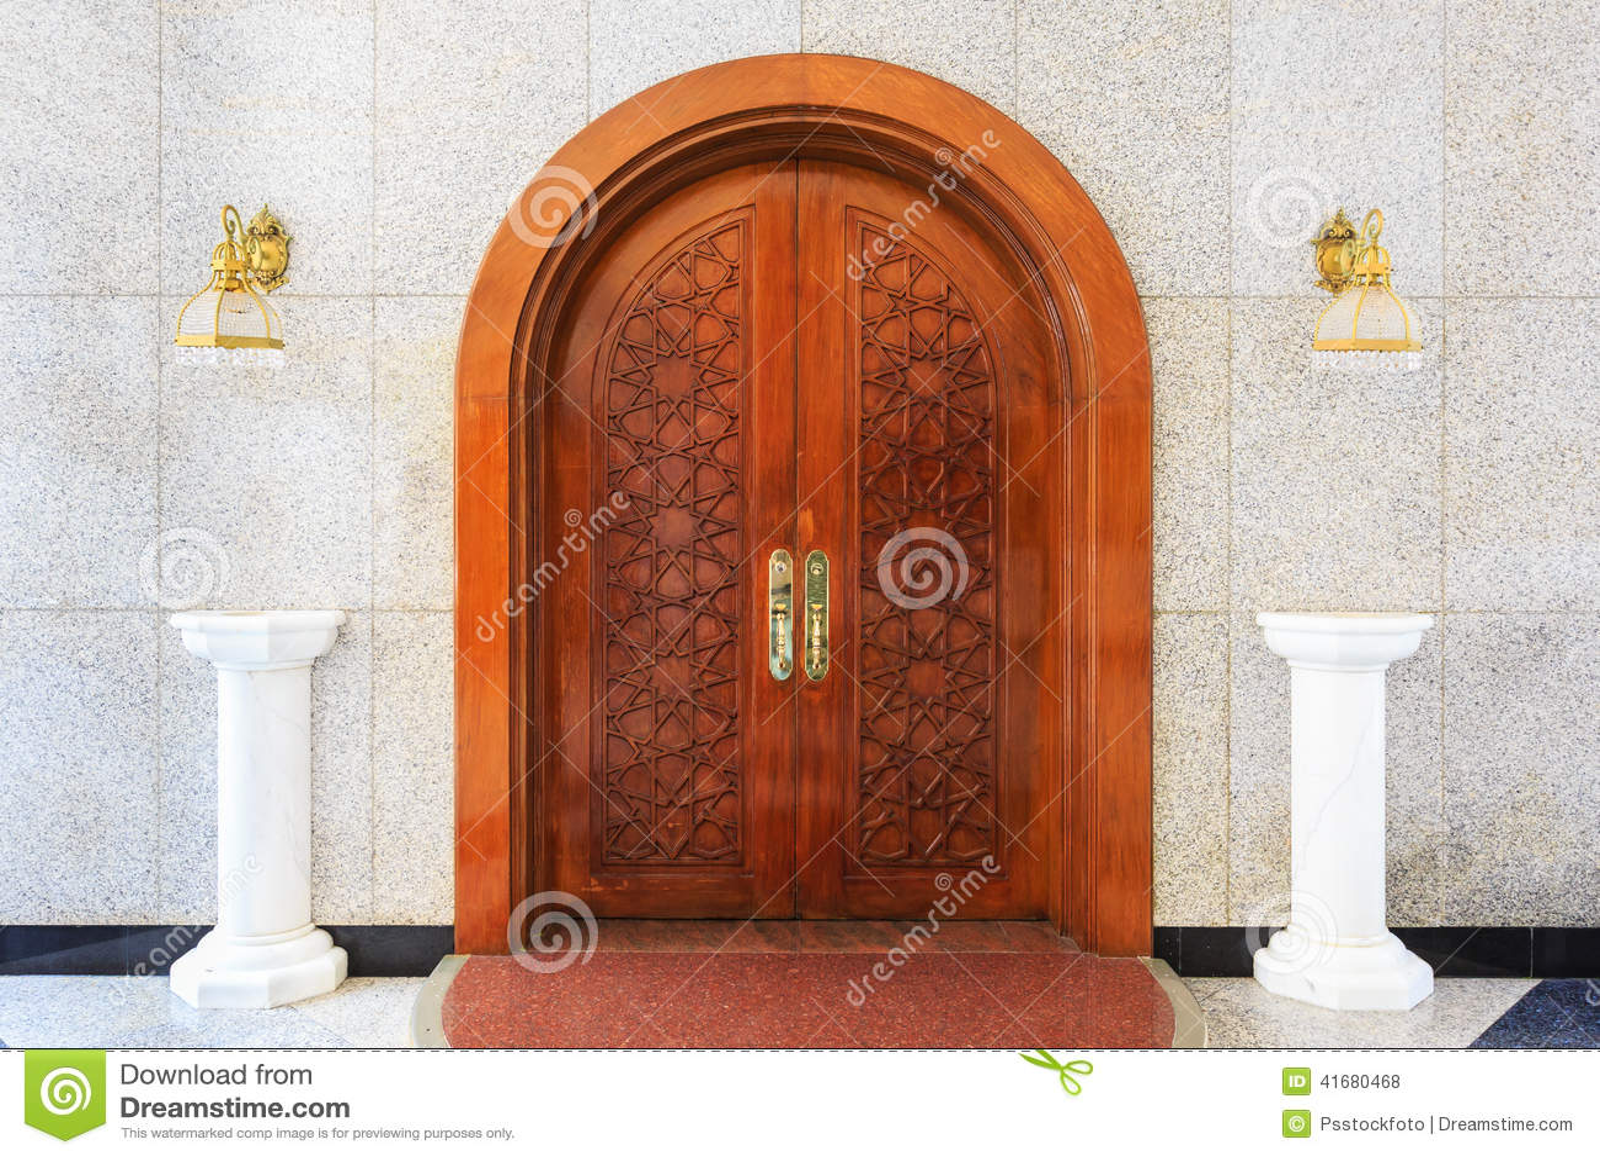 Royalty-Free Stock Photo. Download Masjid Door ... & Masjid Door Stock Photo - Image: 41680468 pezcame.com